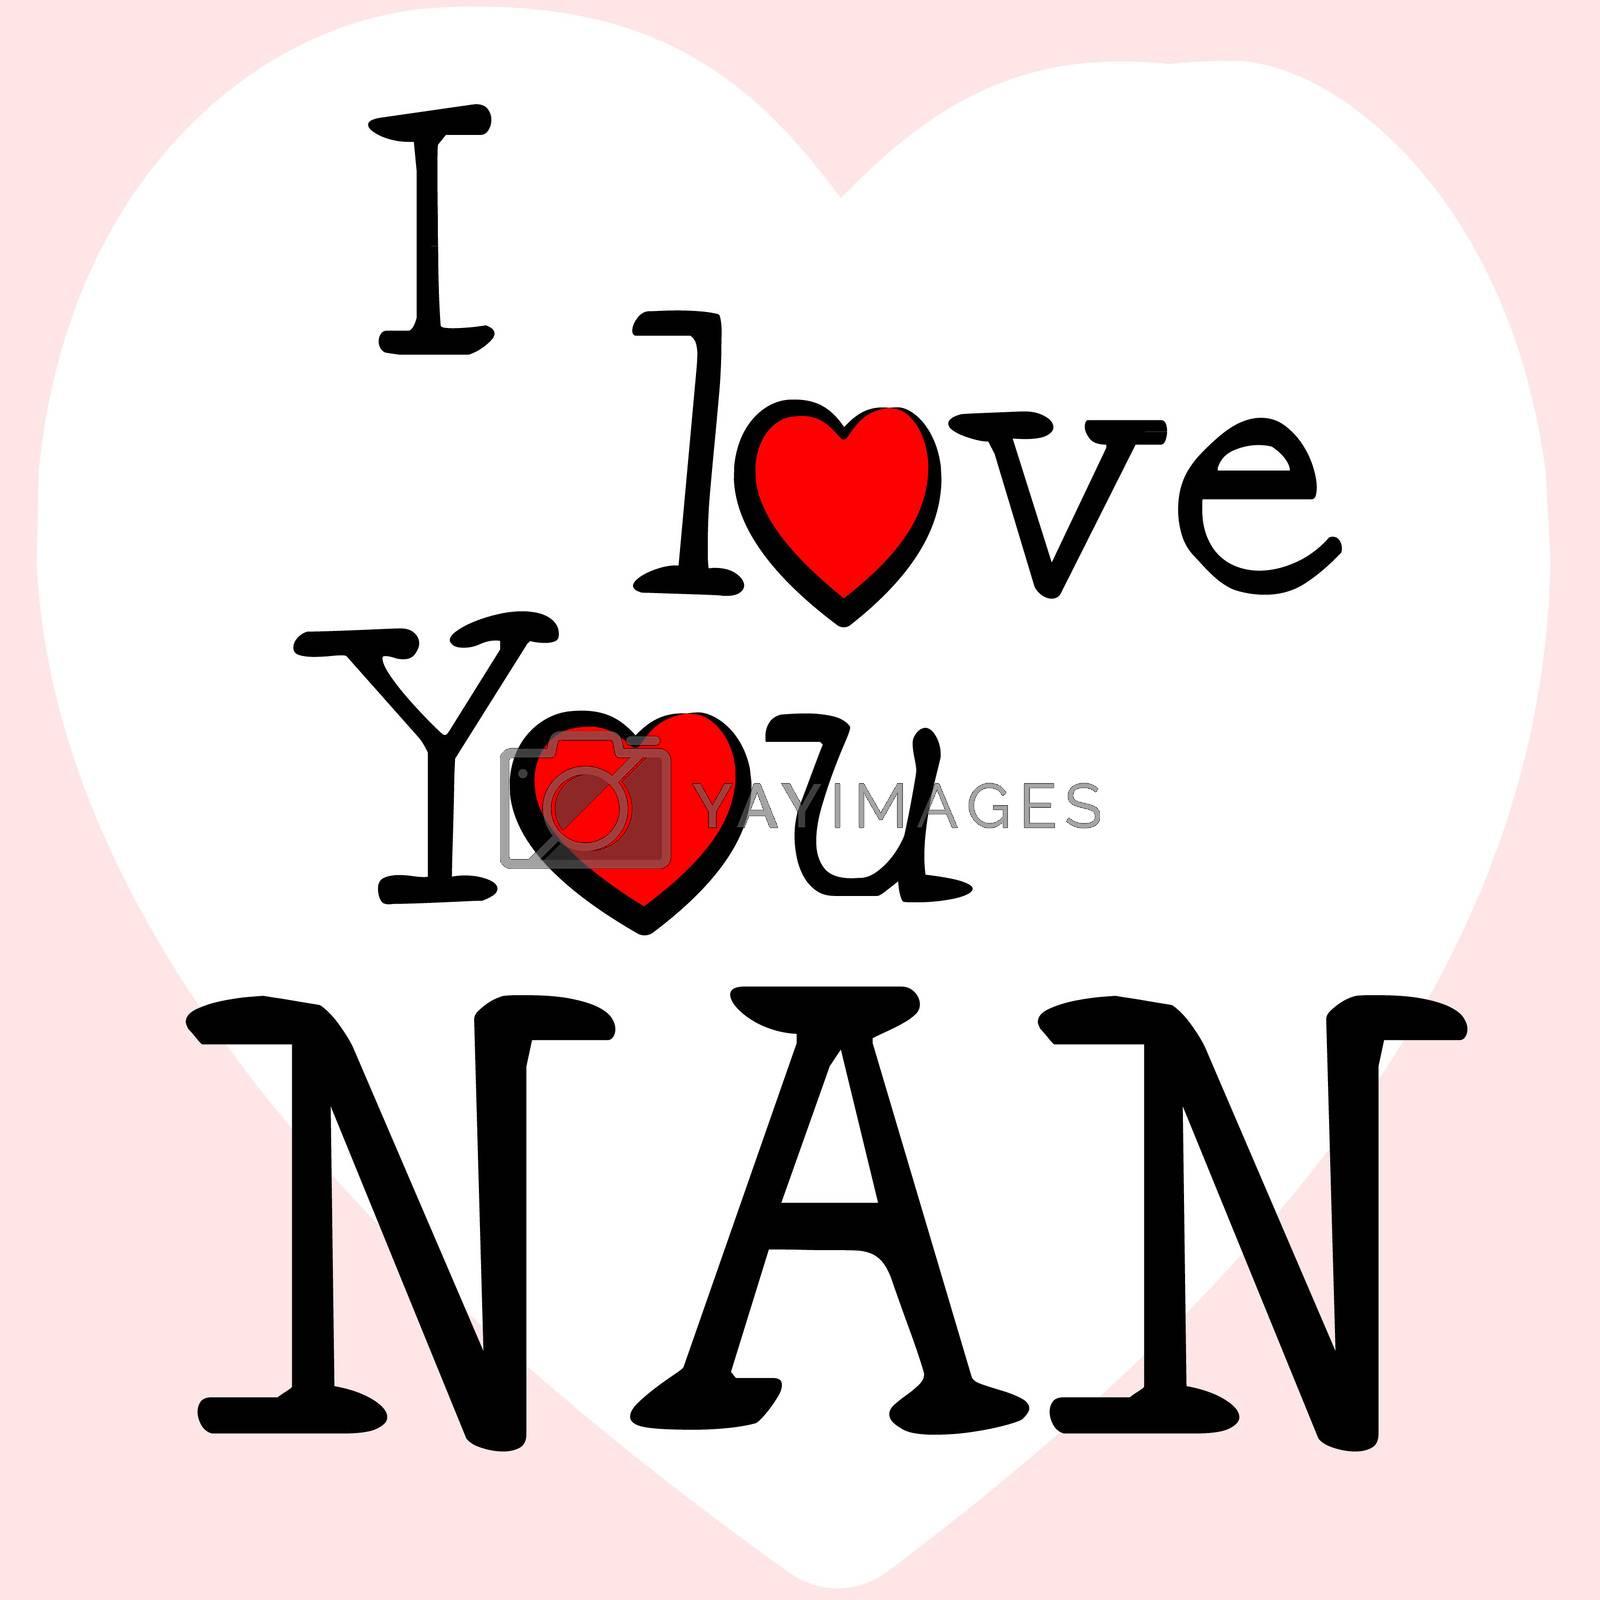 I Love Nan Represents Romance Grandma And Granny by stuartmiles